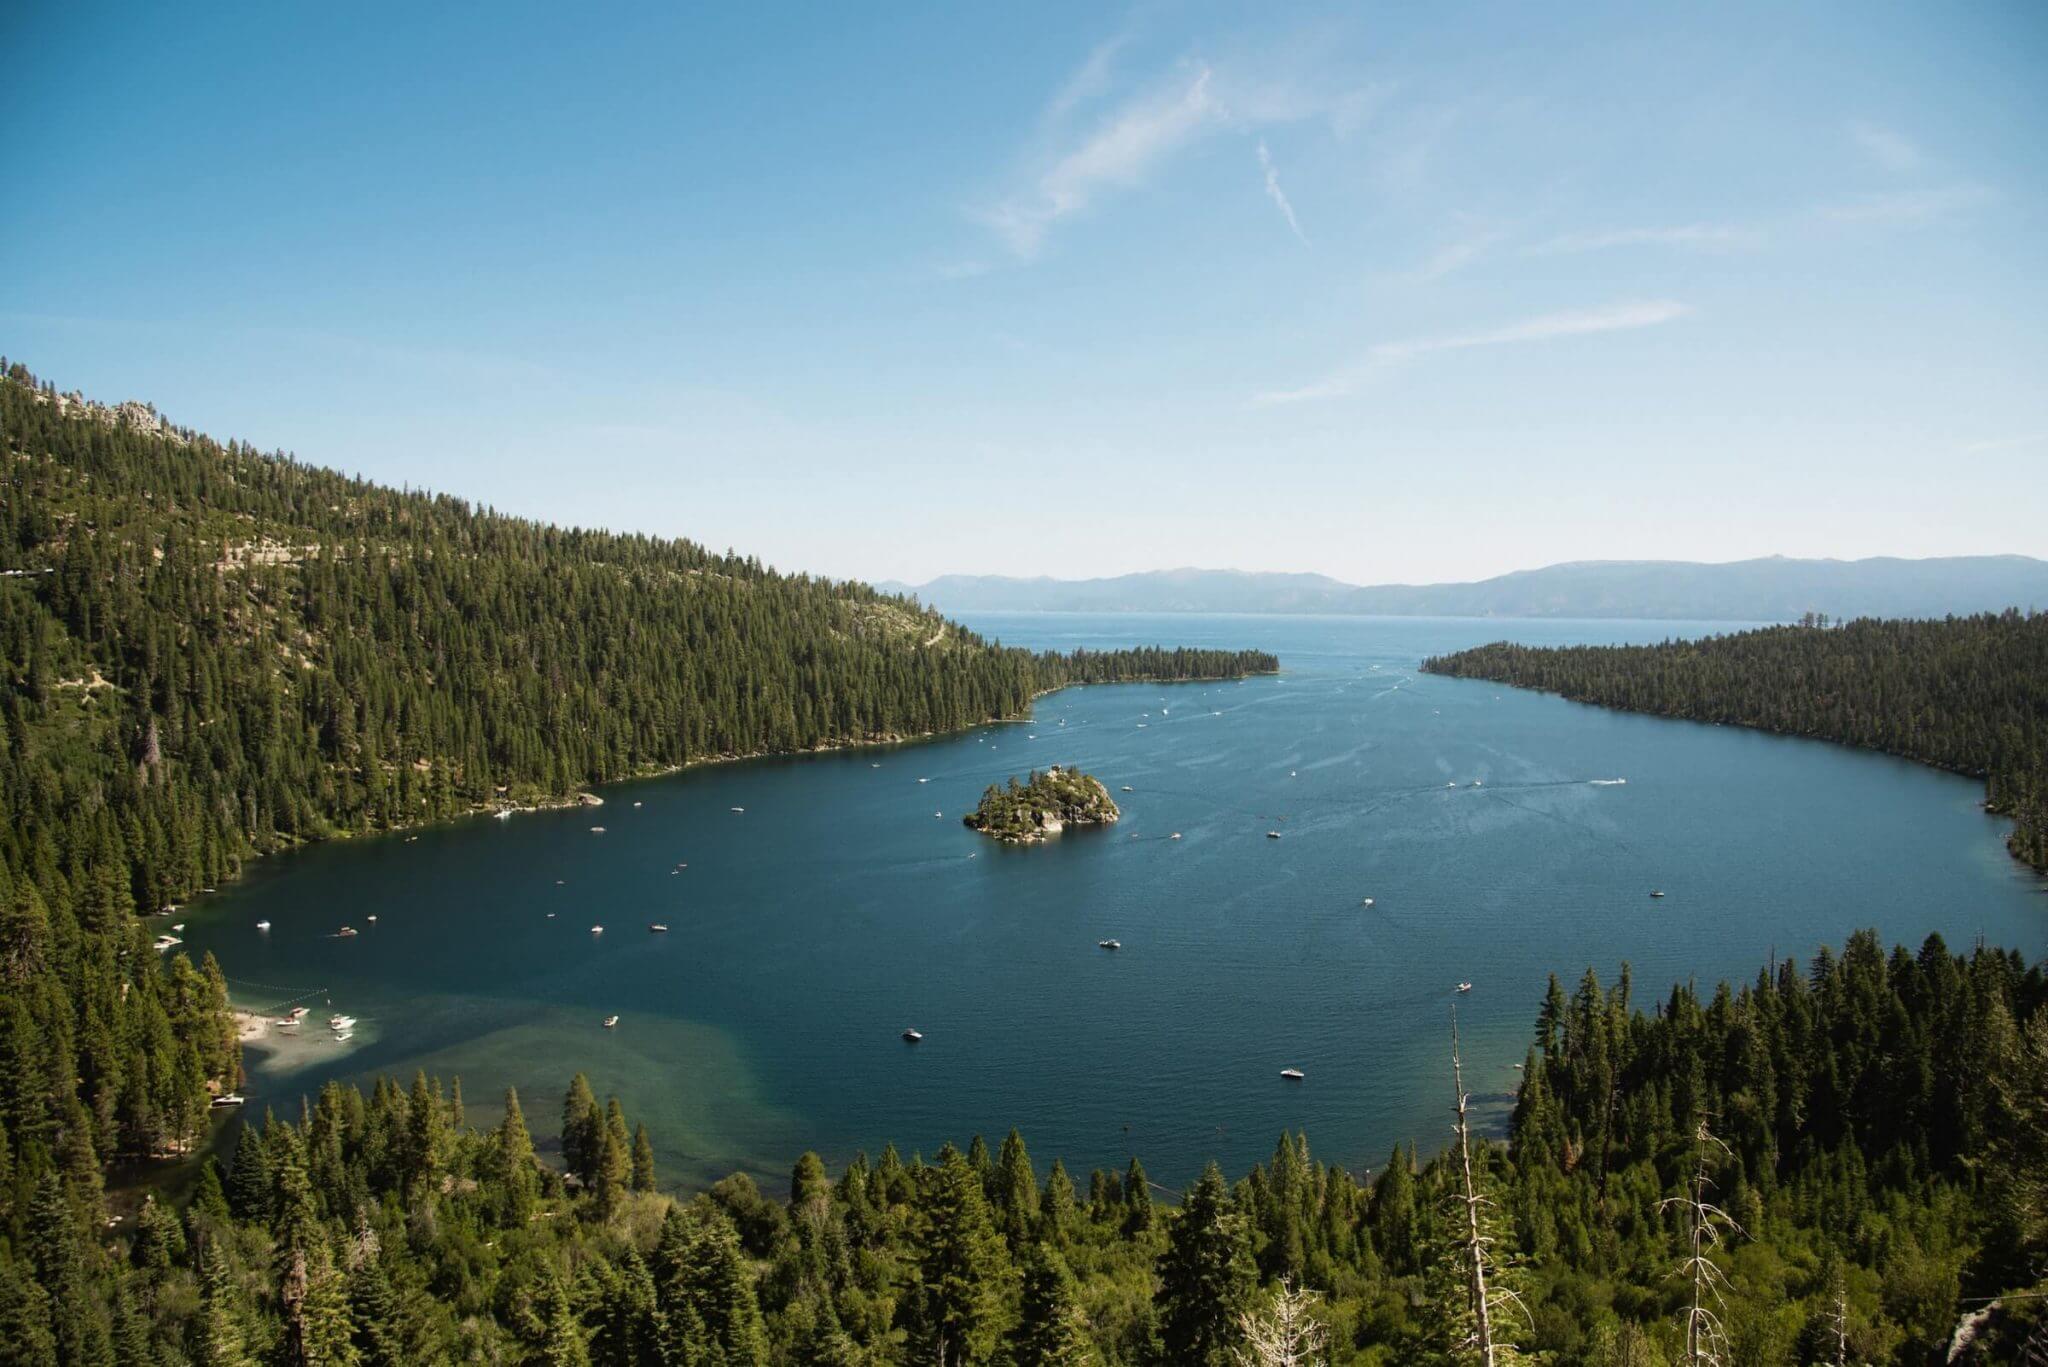 Lake Tahoe getaway from Sacramento as a day trip